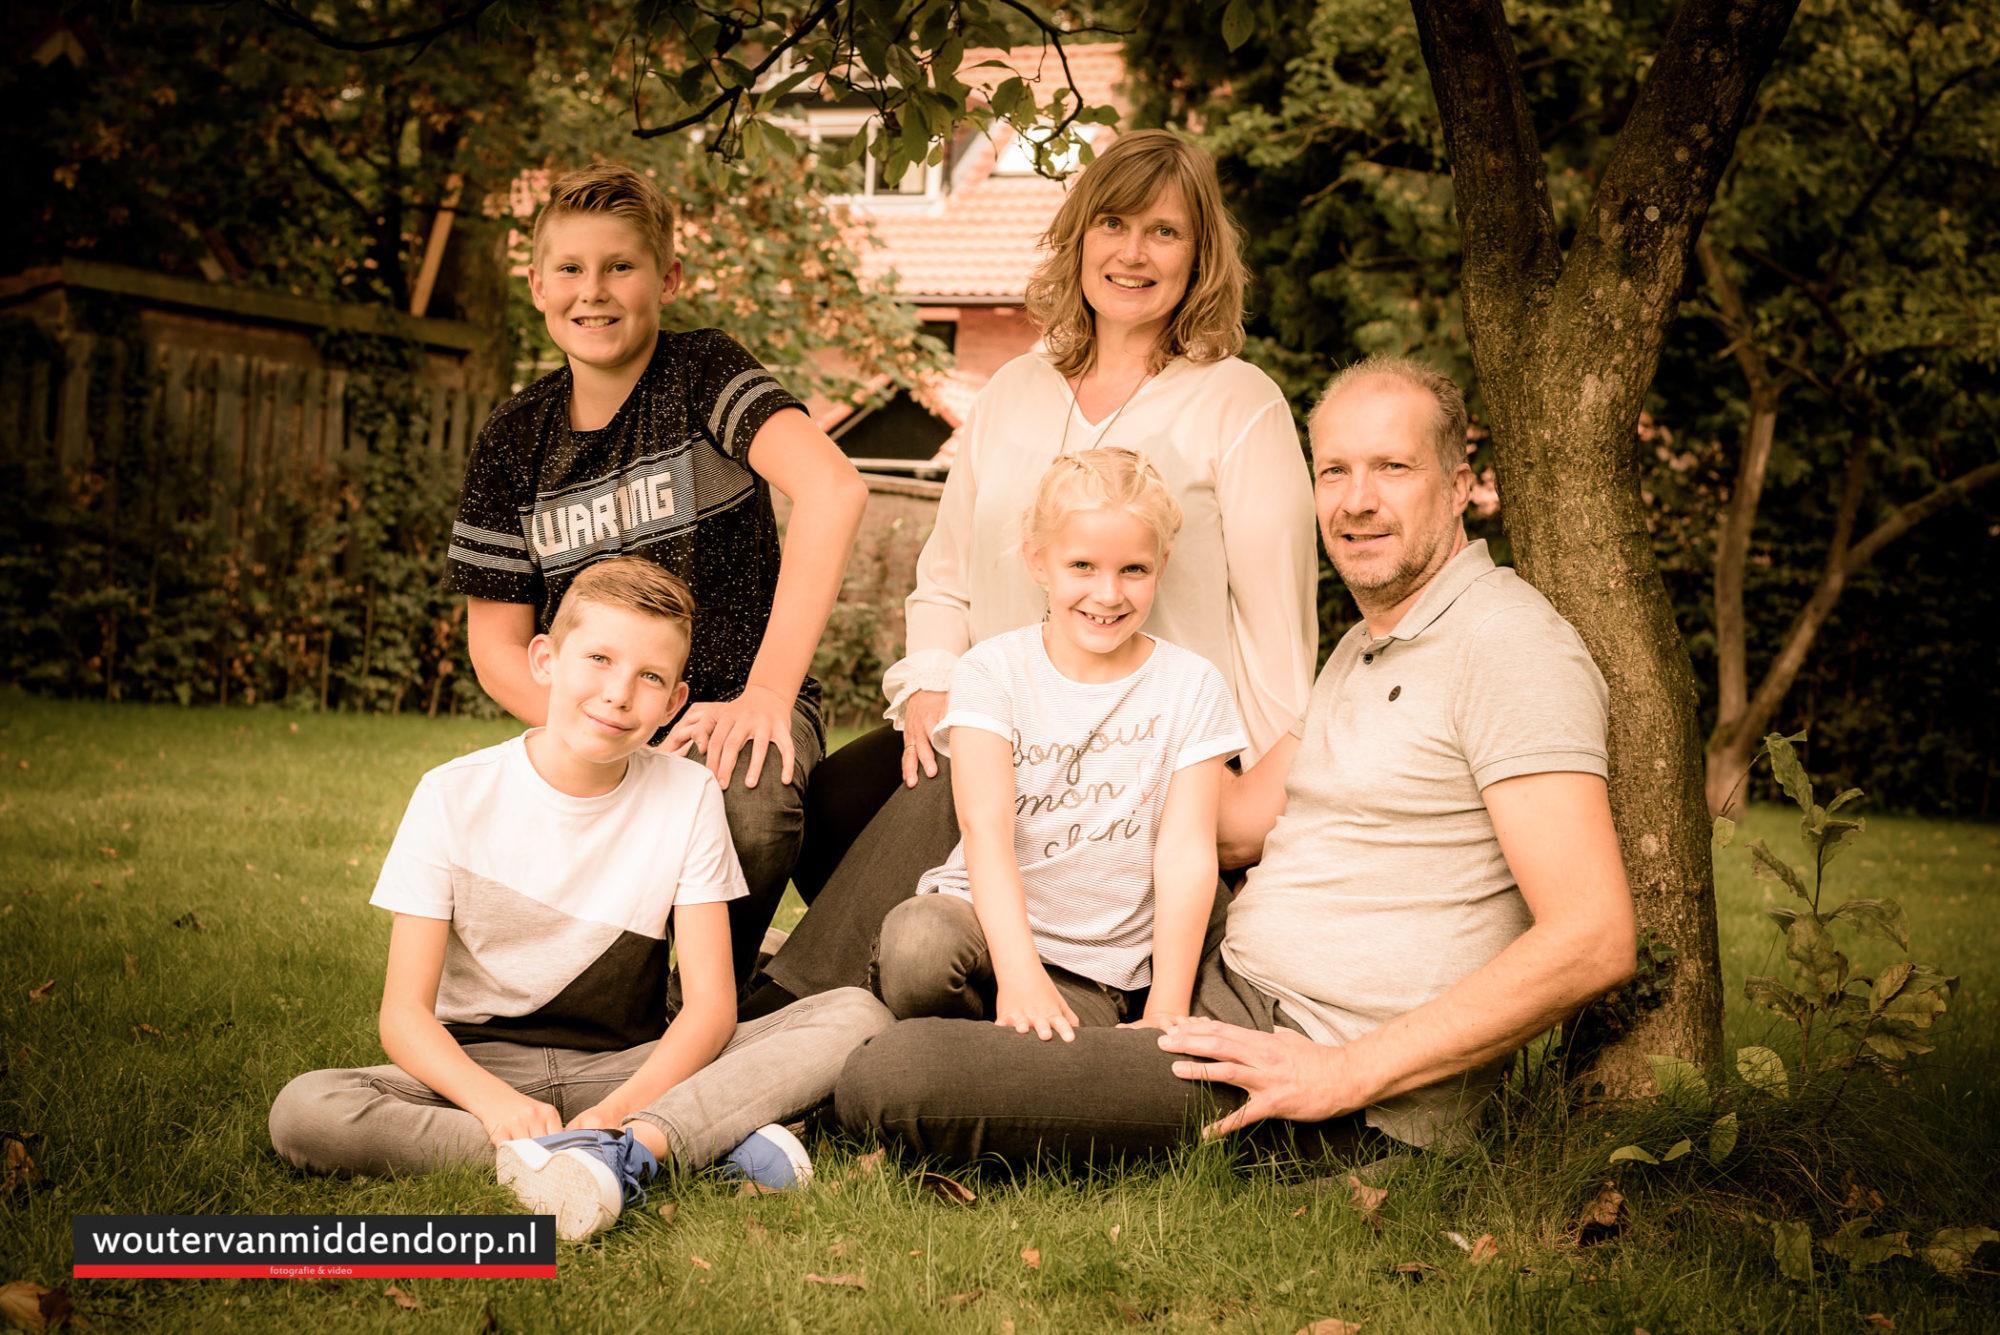 fotograaf Wouter van Middendorp Nunspeet-1